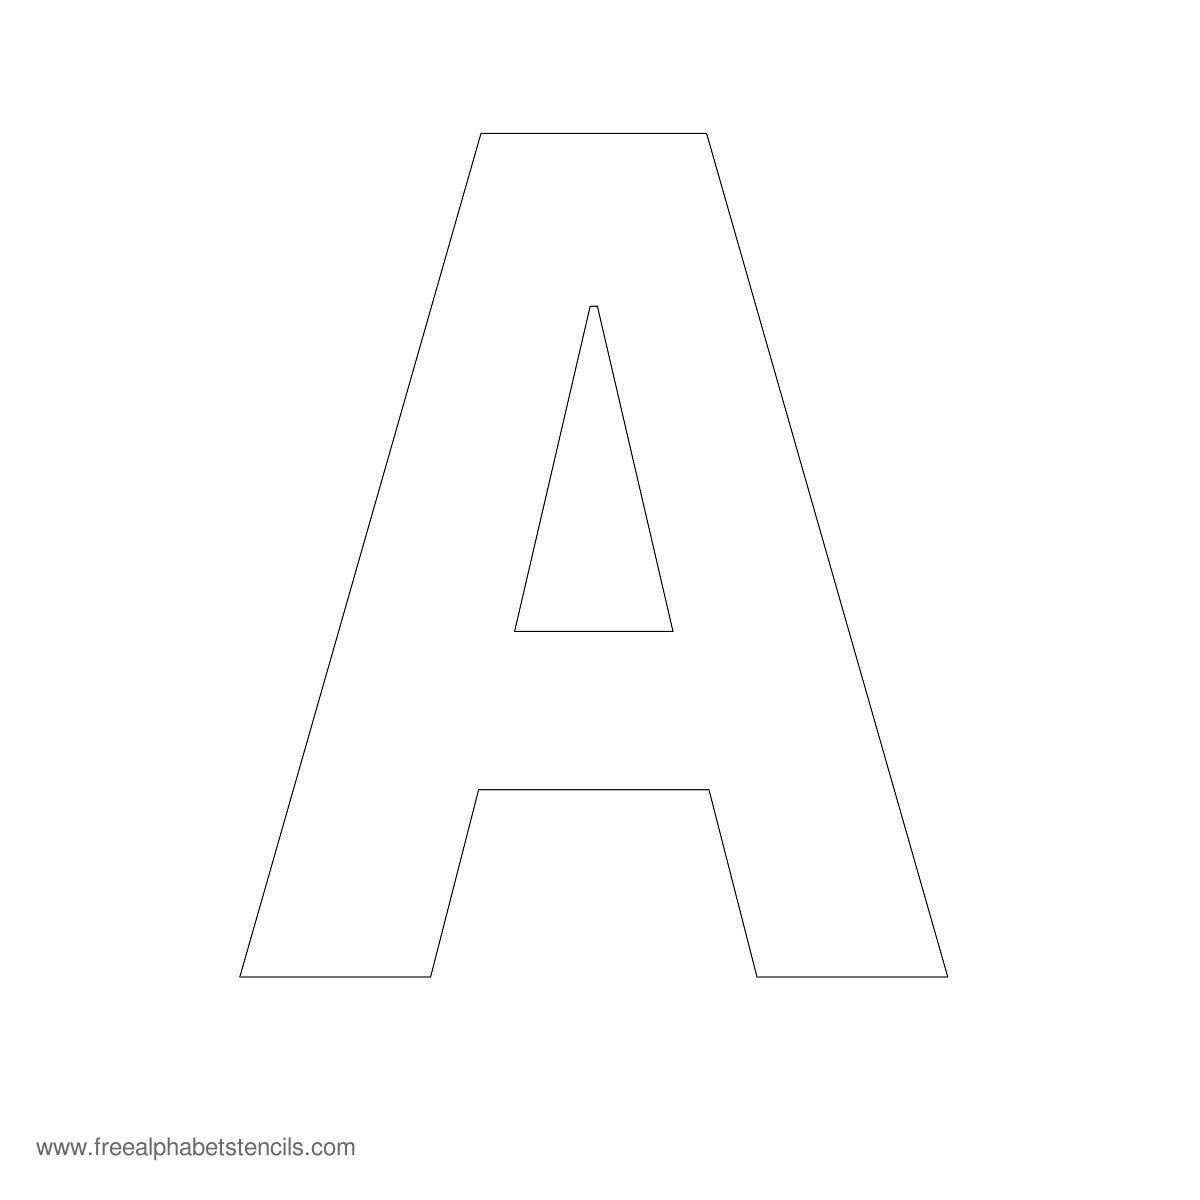 Free Printable Fancy Letters | Free Printable Large Alphabet Letter - Free Printable 8 Inch Letters